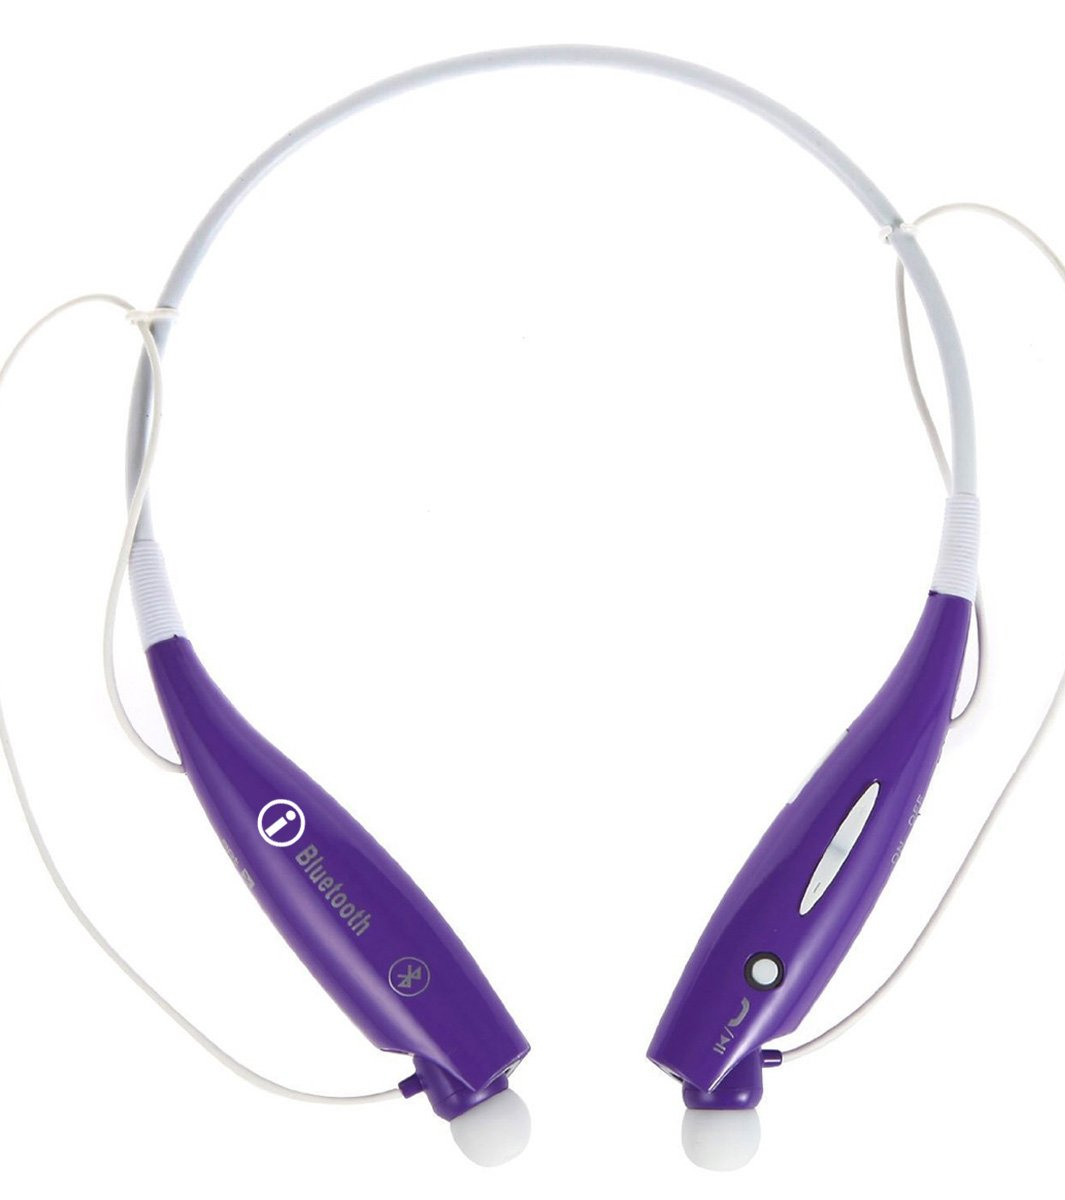 Universal S Gear -HV-Digitial 800 Wireless Music A2dp Stereo Bluetooth Headset Neckband Style Earphone Headphone performance flexible comfort quick Foldable PURPLE